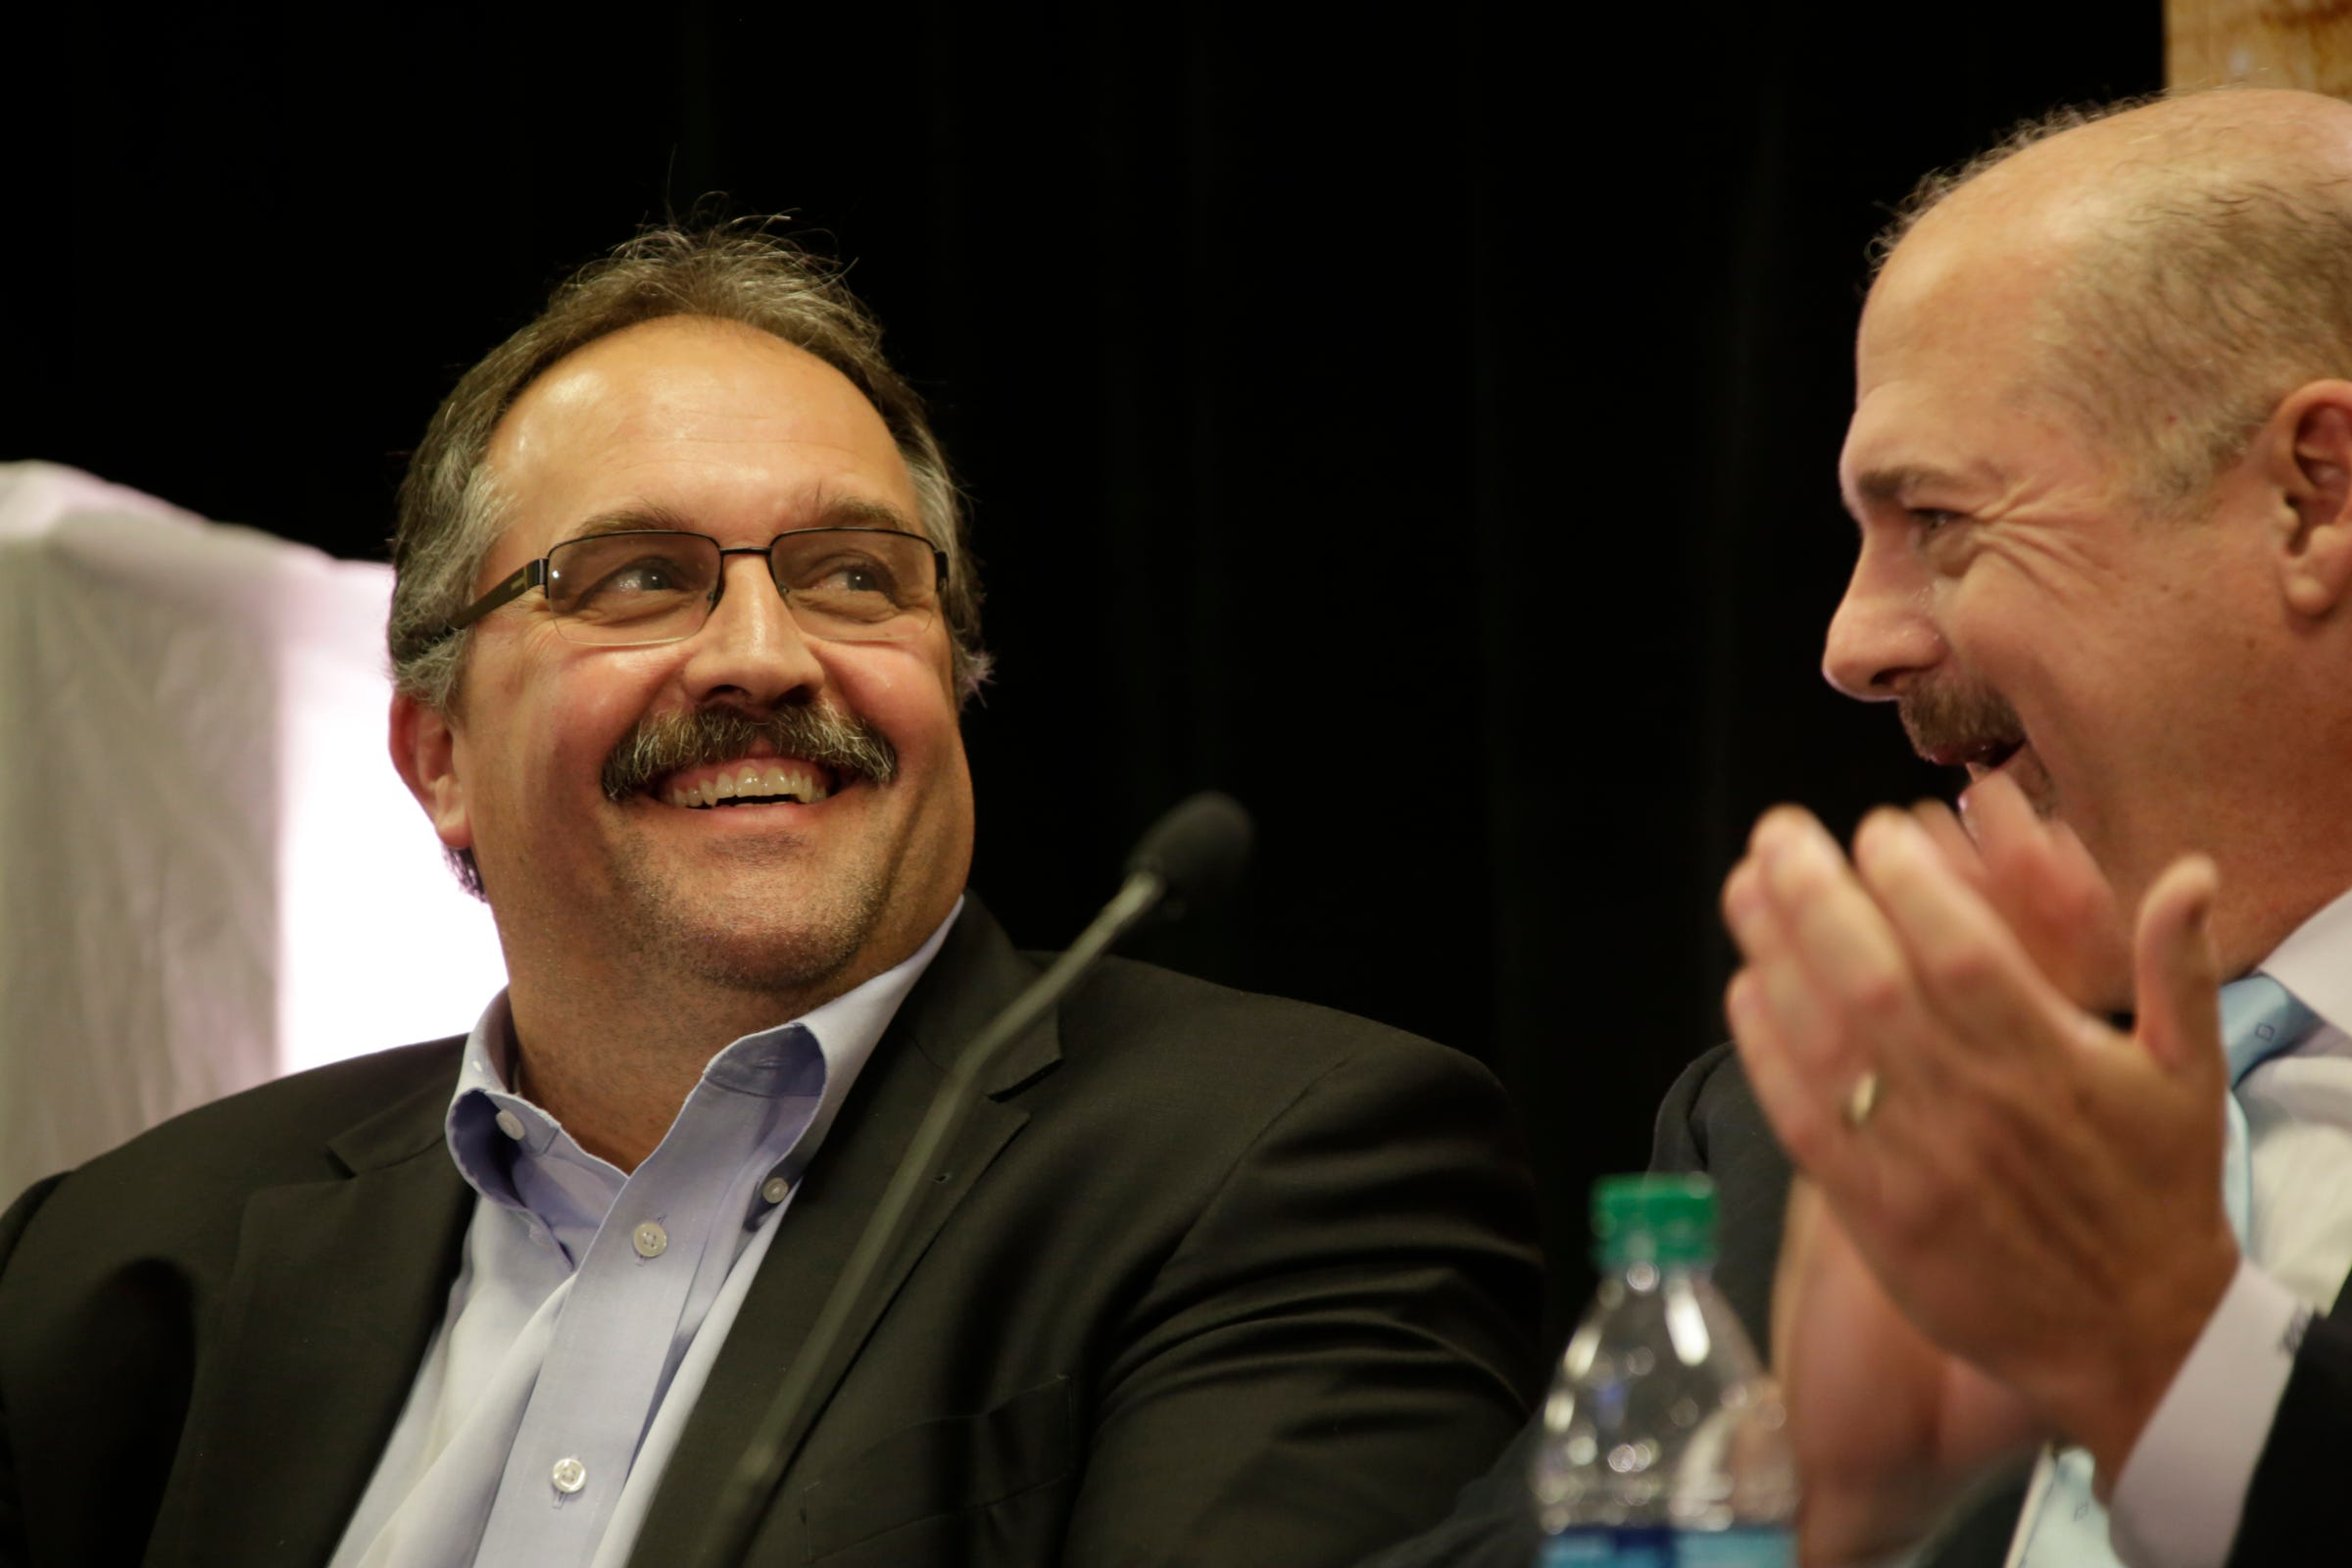 Pro basketball writers honor Detroit Pistons' Stan Van Gundy with media award